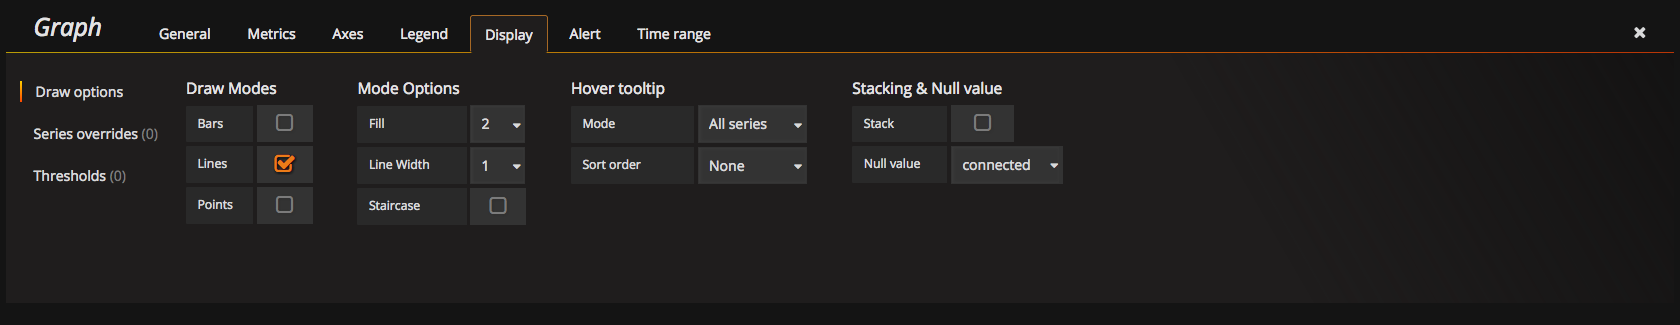 Store Nagios or Naemon Performance Data to MySQL